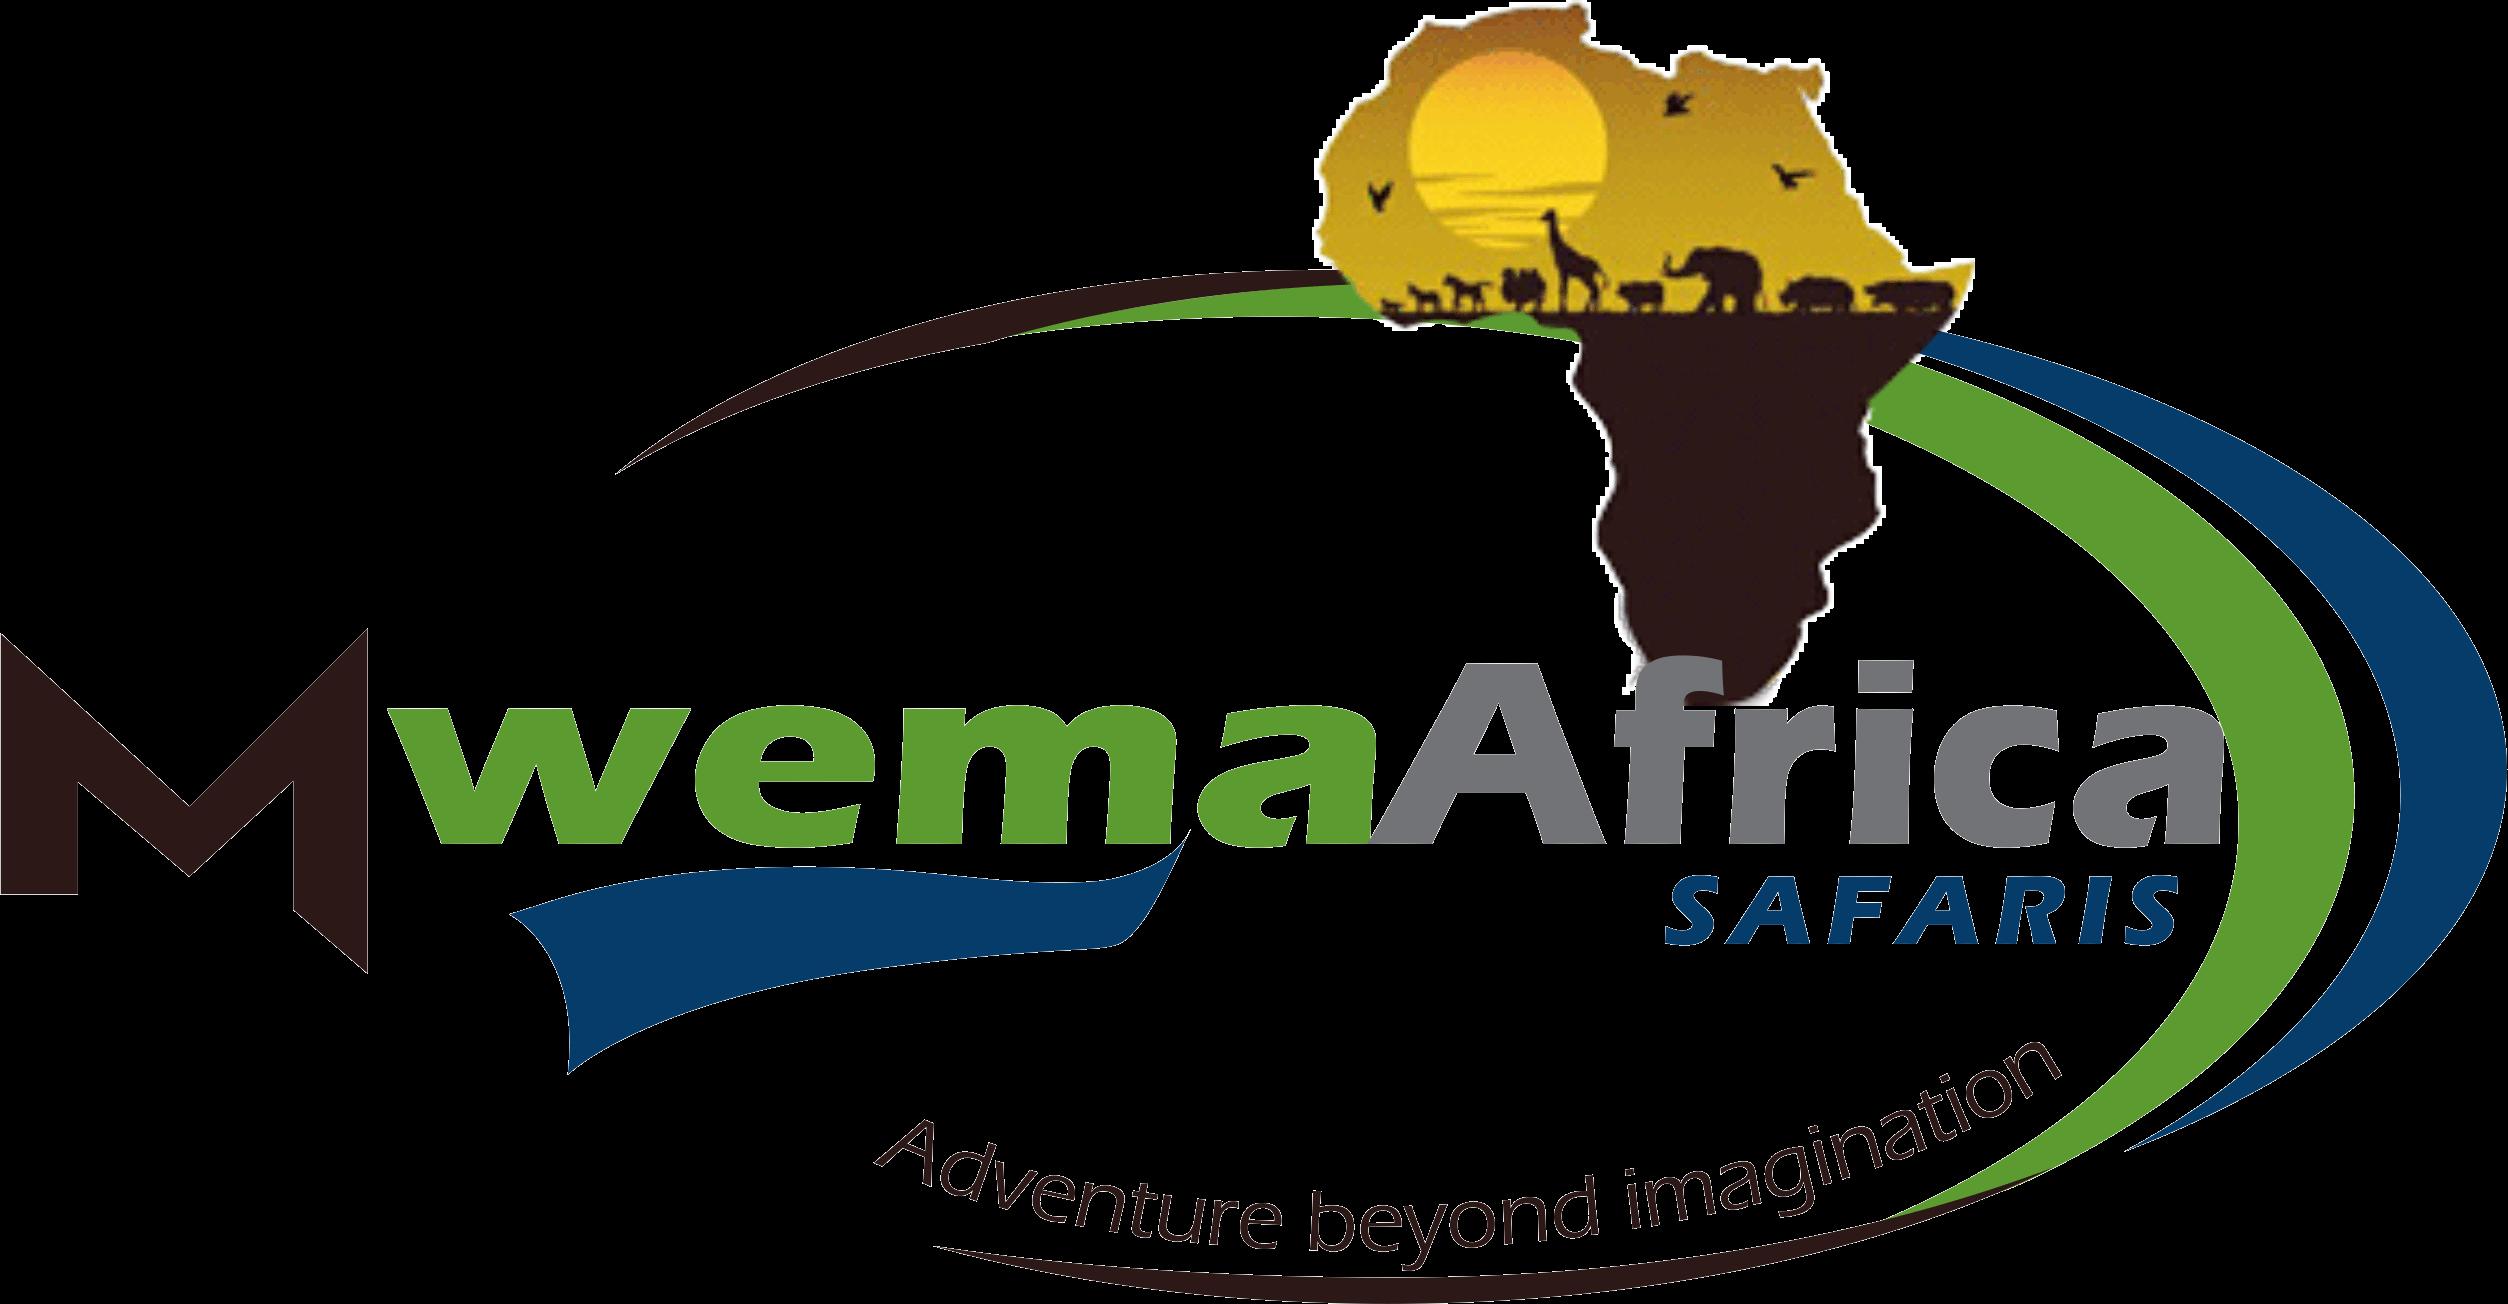 Adventure clipart african safari Safari The Africa Safari Mwema